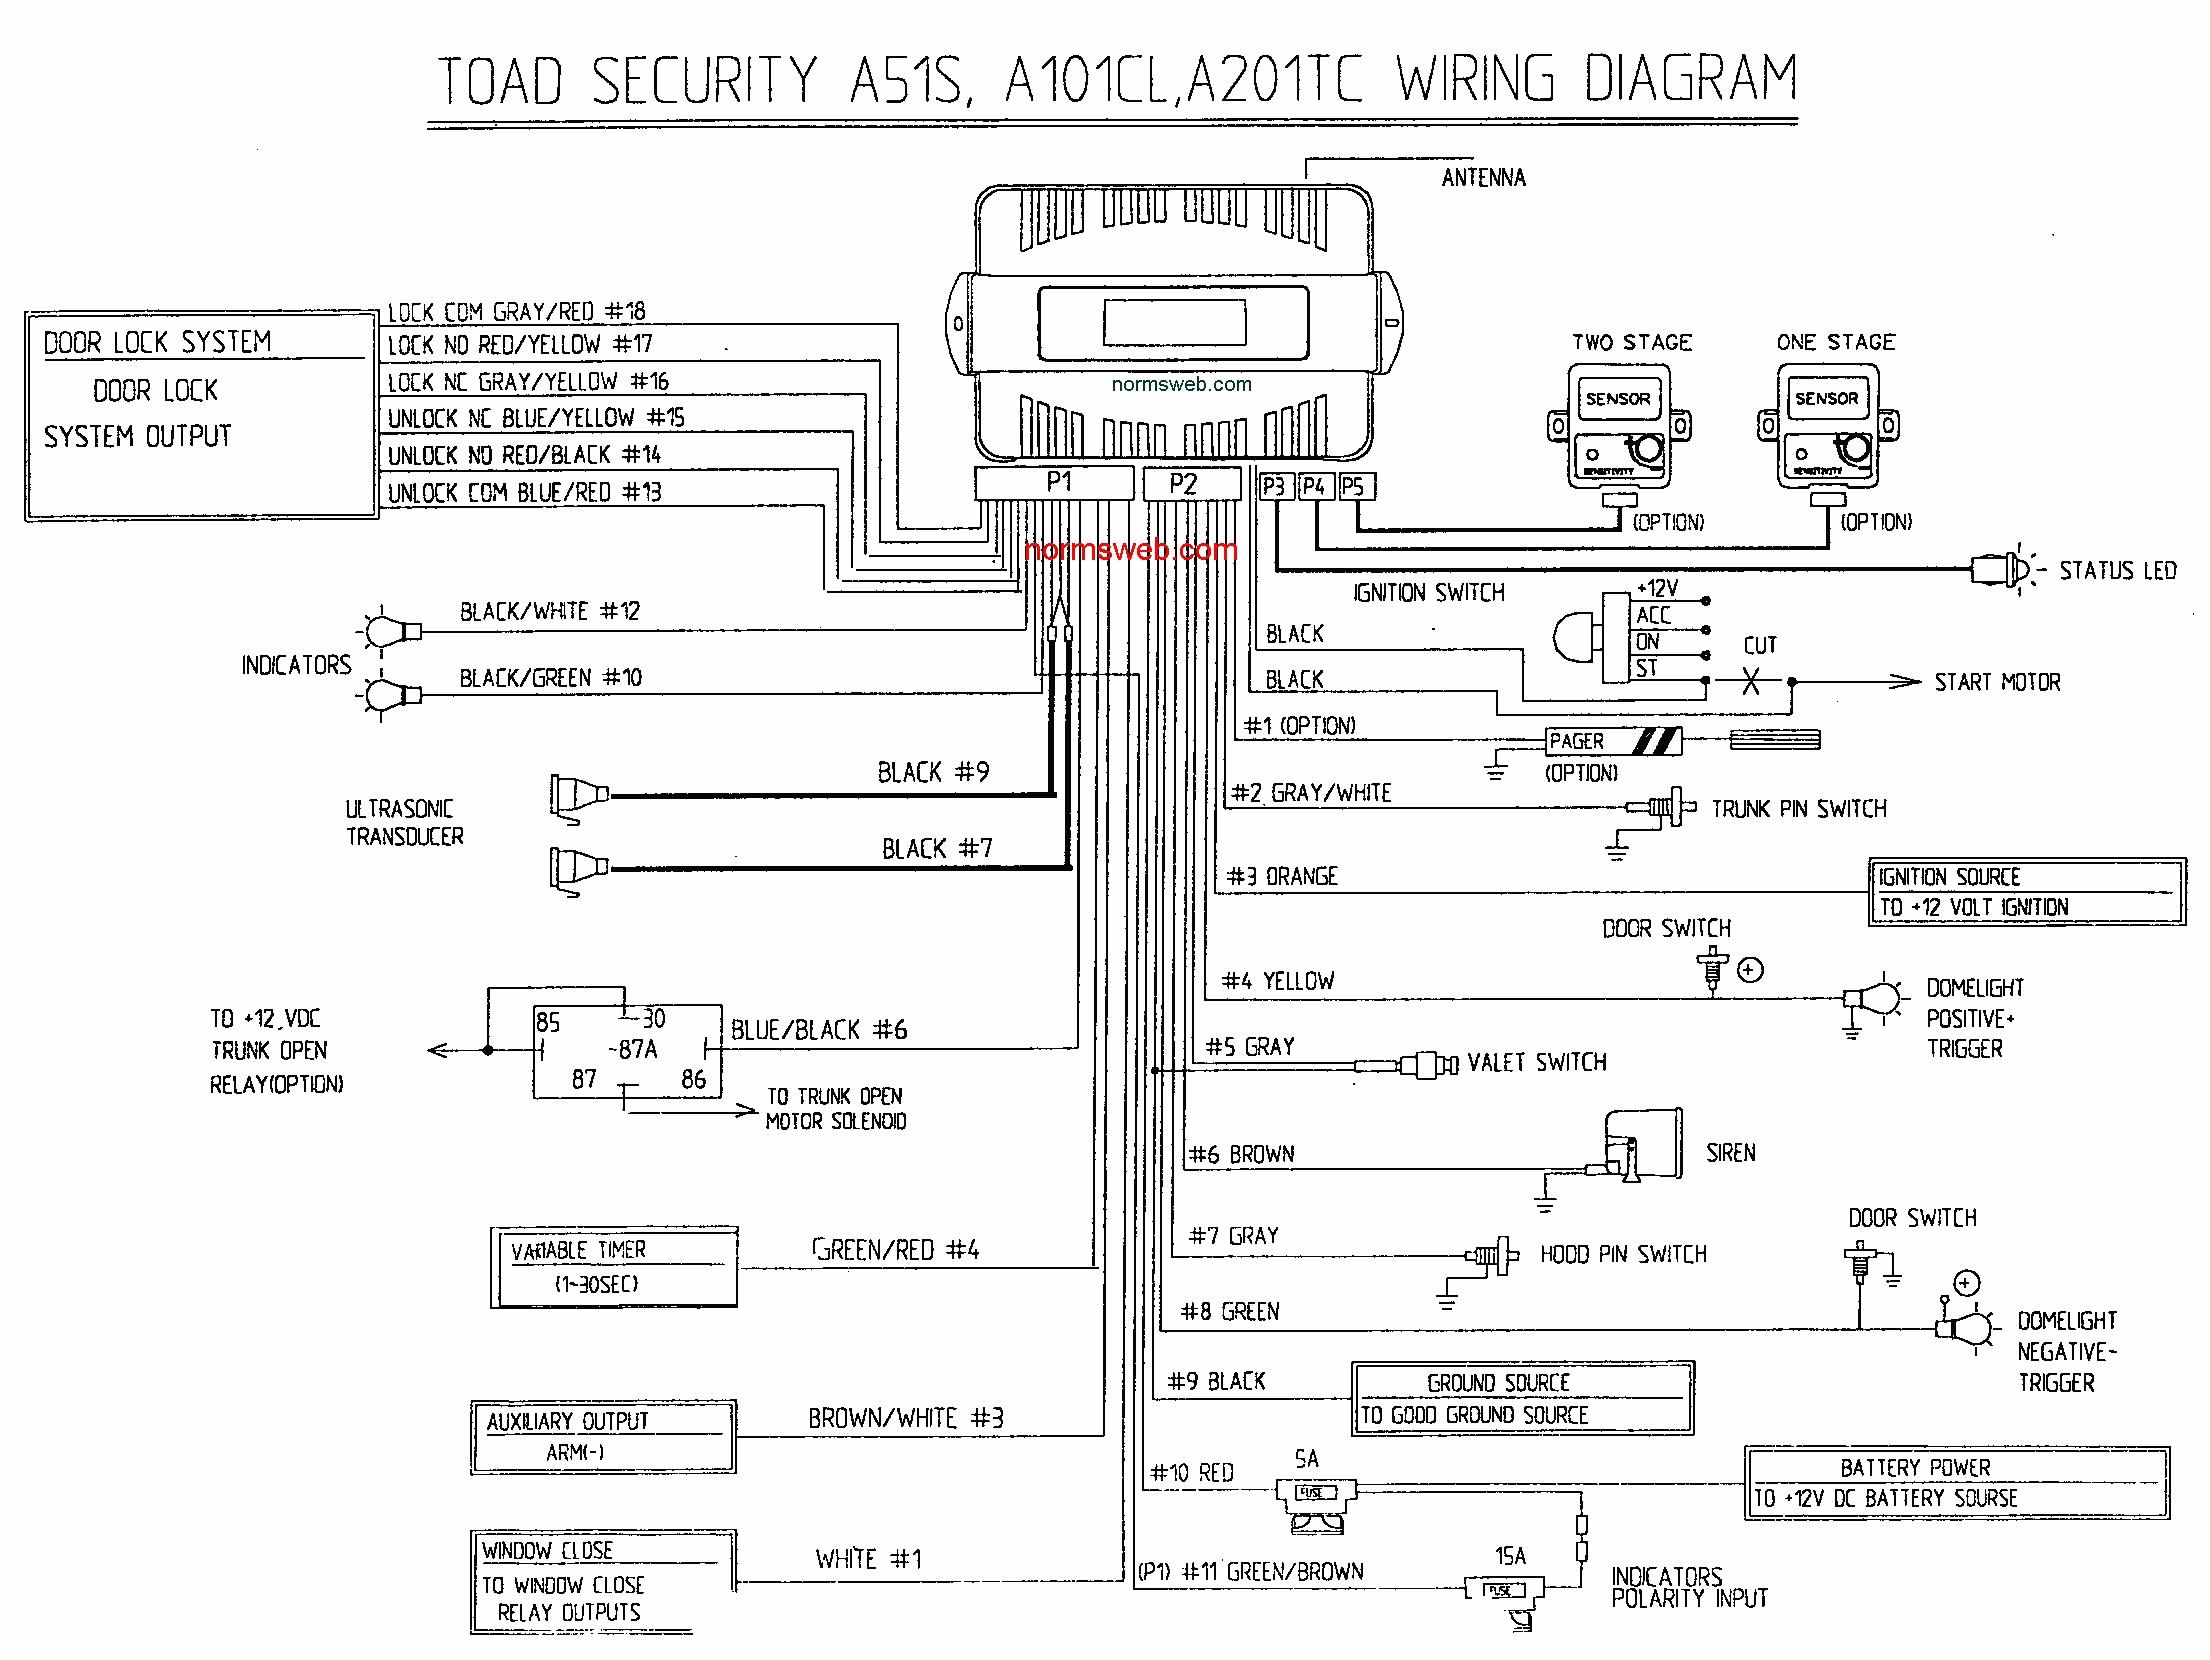 dei wiring diagrams wiring diagram centredei wiring diagram wiring diagramdei wiring diagram library wiring diagramdei wiring